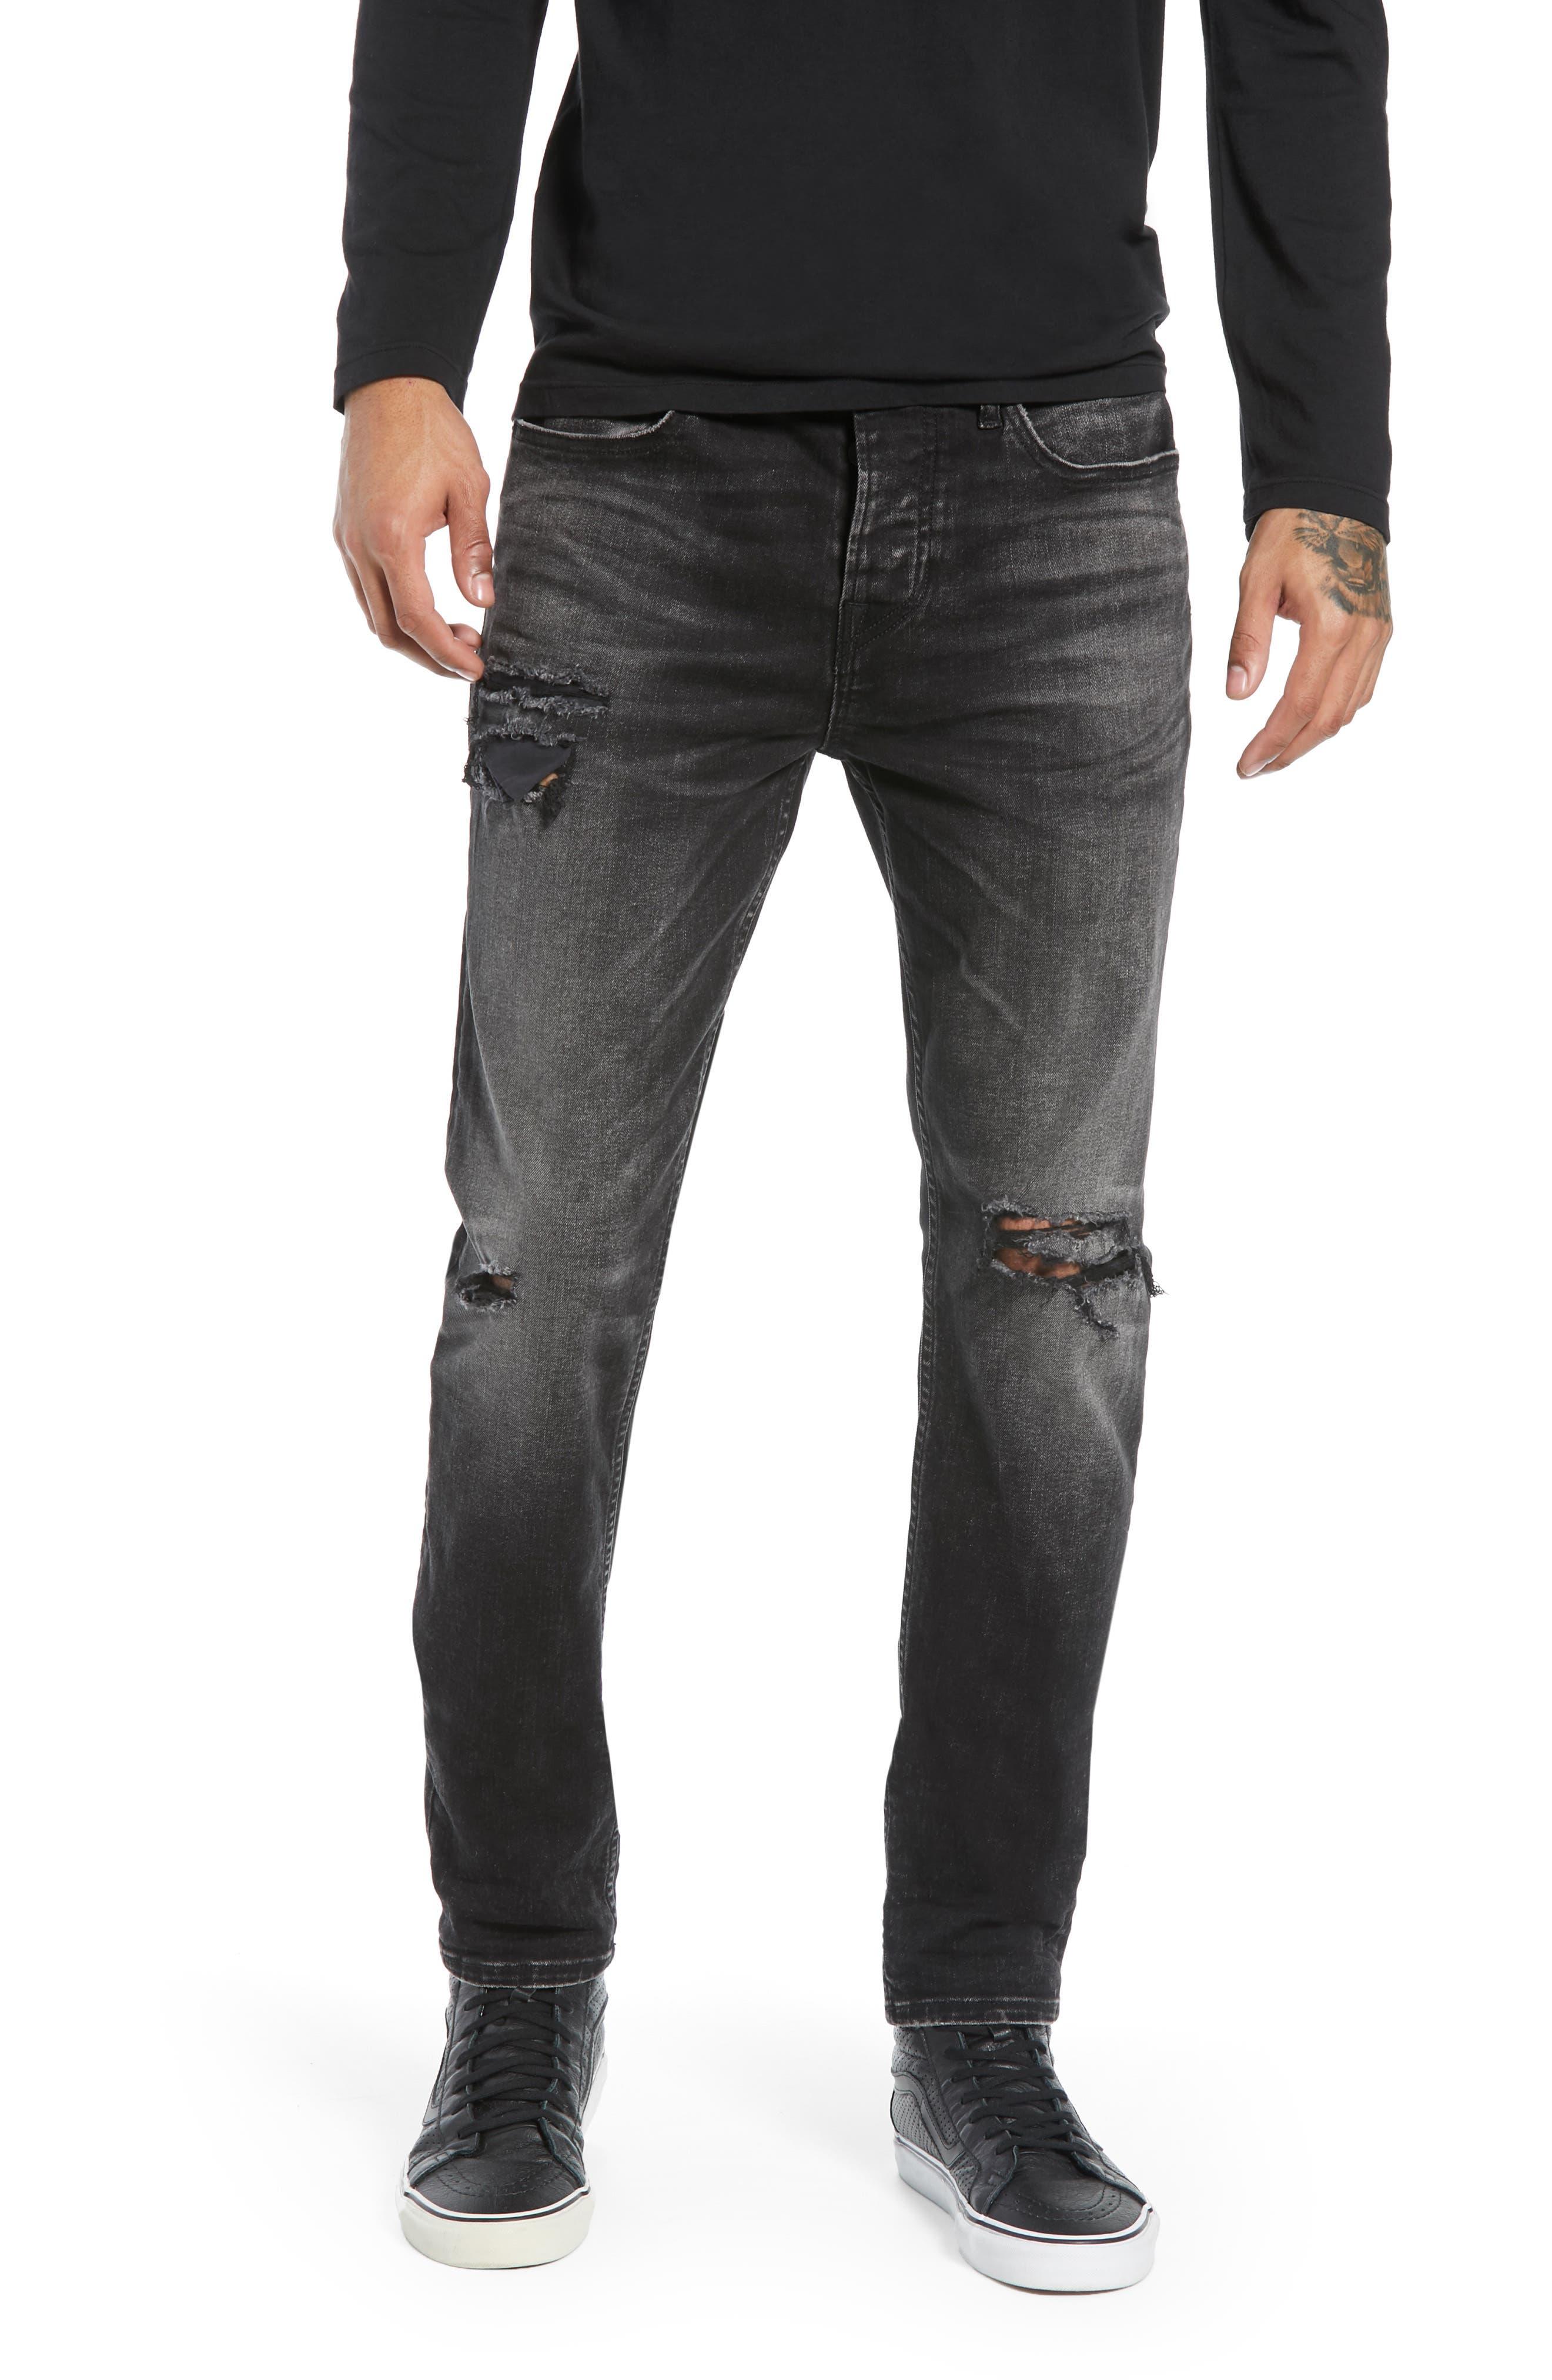 5fbcc33ba9c Sale: Men's Hudson Jeans Clothing | Nordstrom